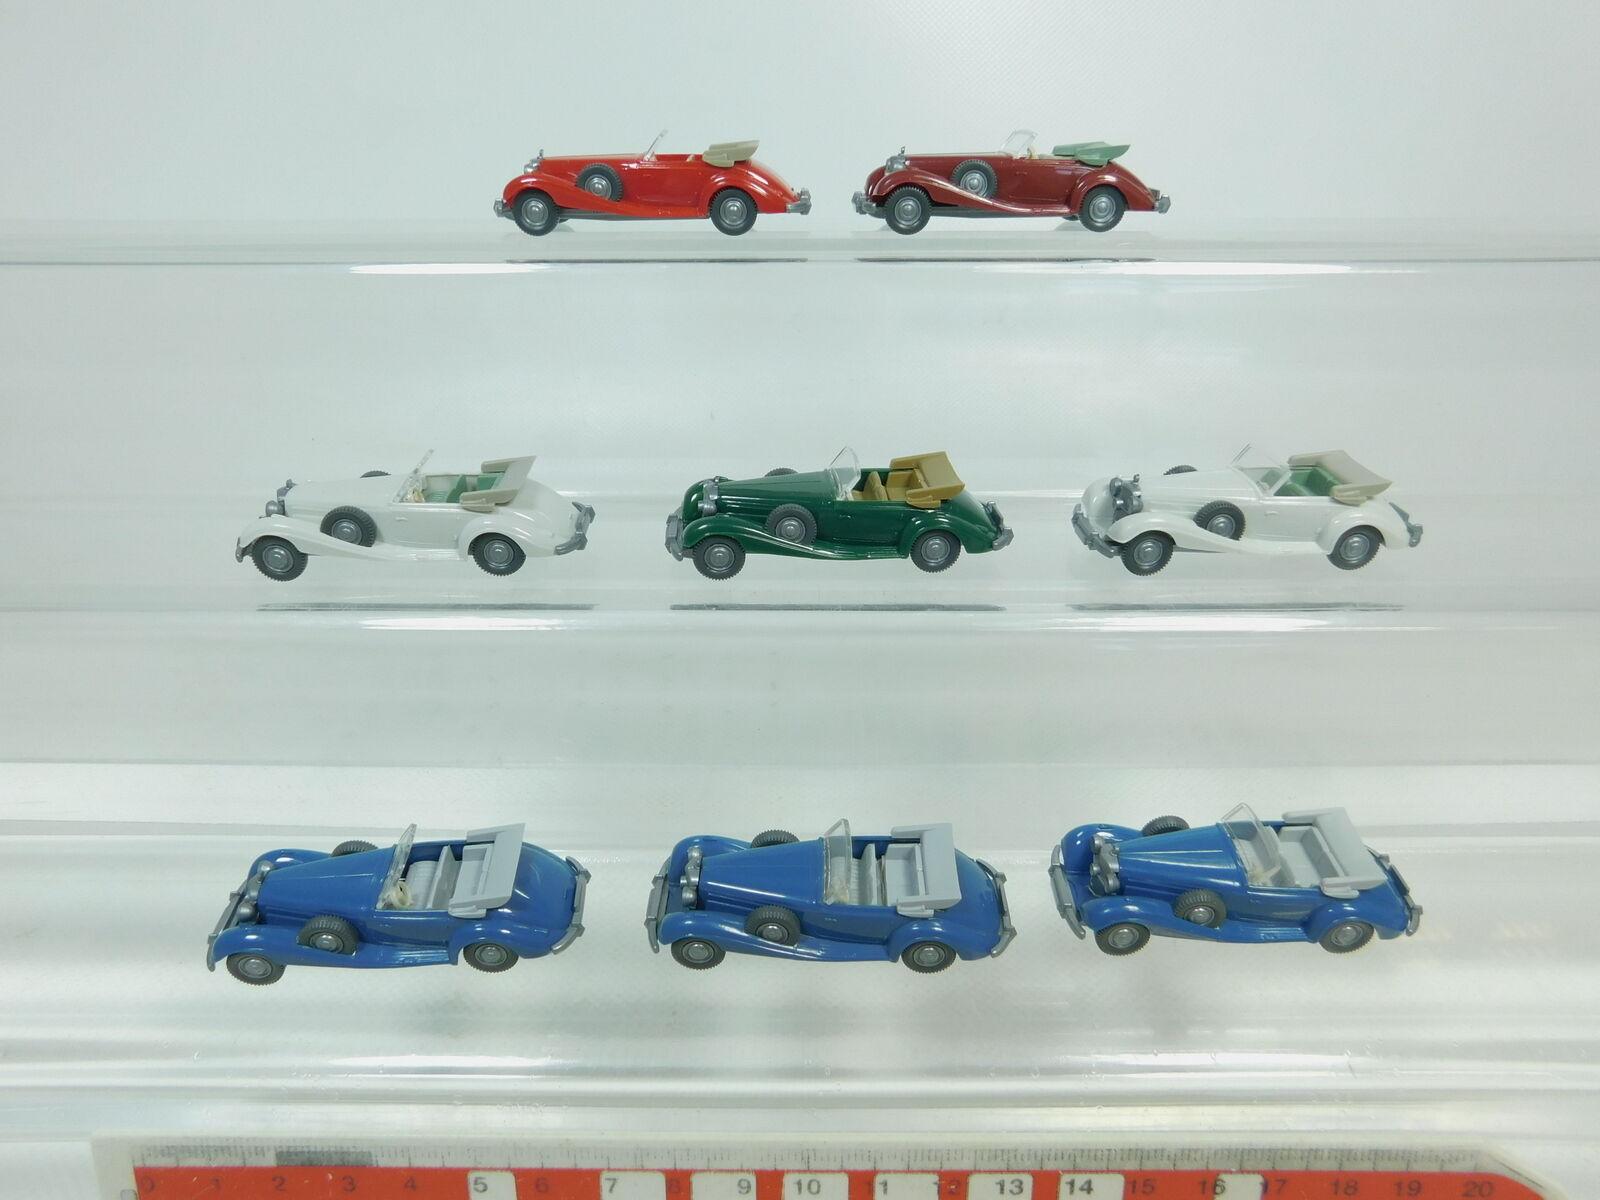 Bk54-0, 5 x Wiking H0   1 87 Car Congreenible Cabriolet Mercedes-Benz MB 540